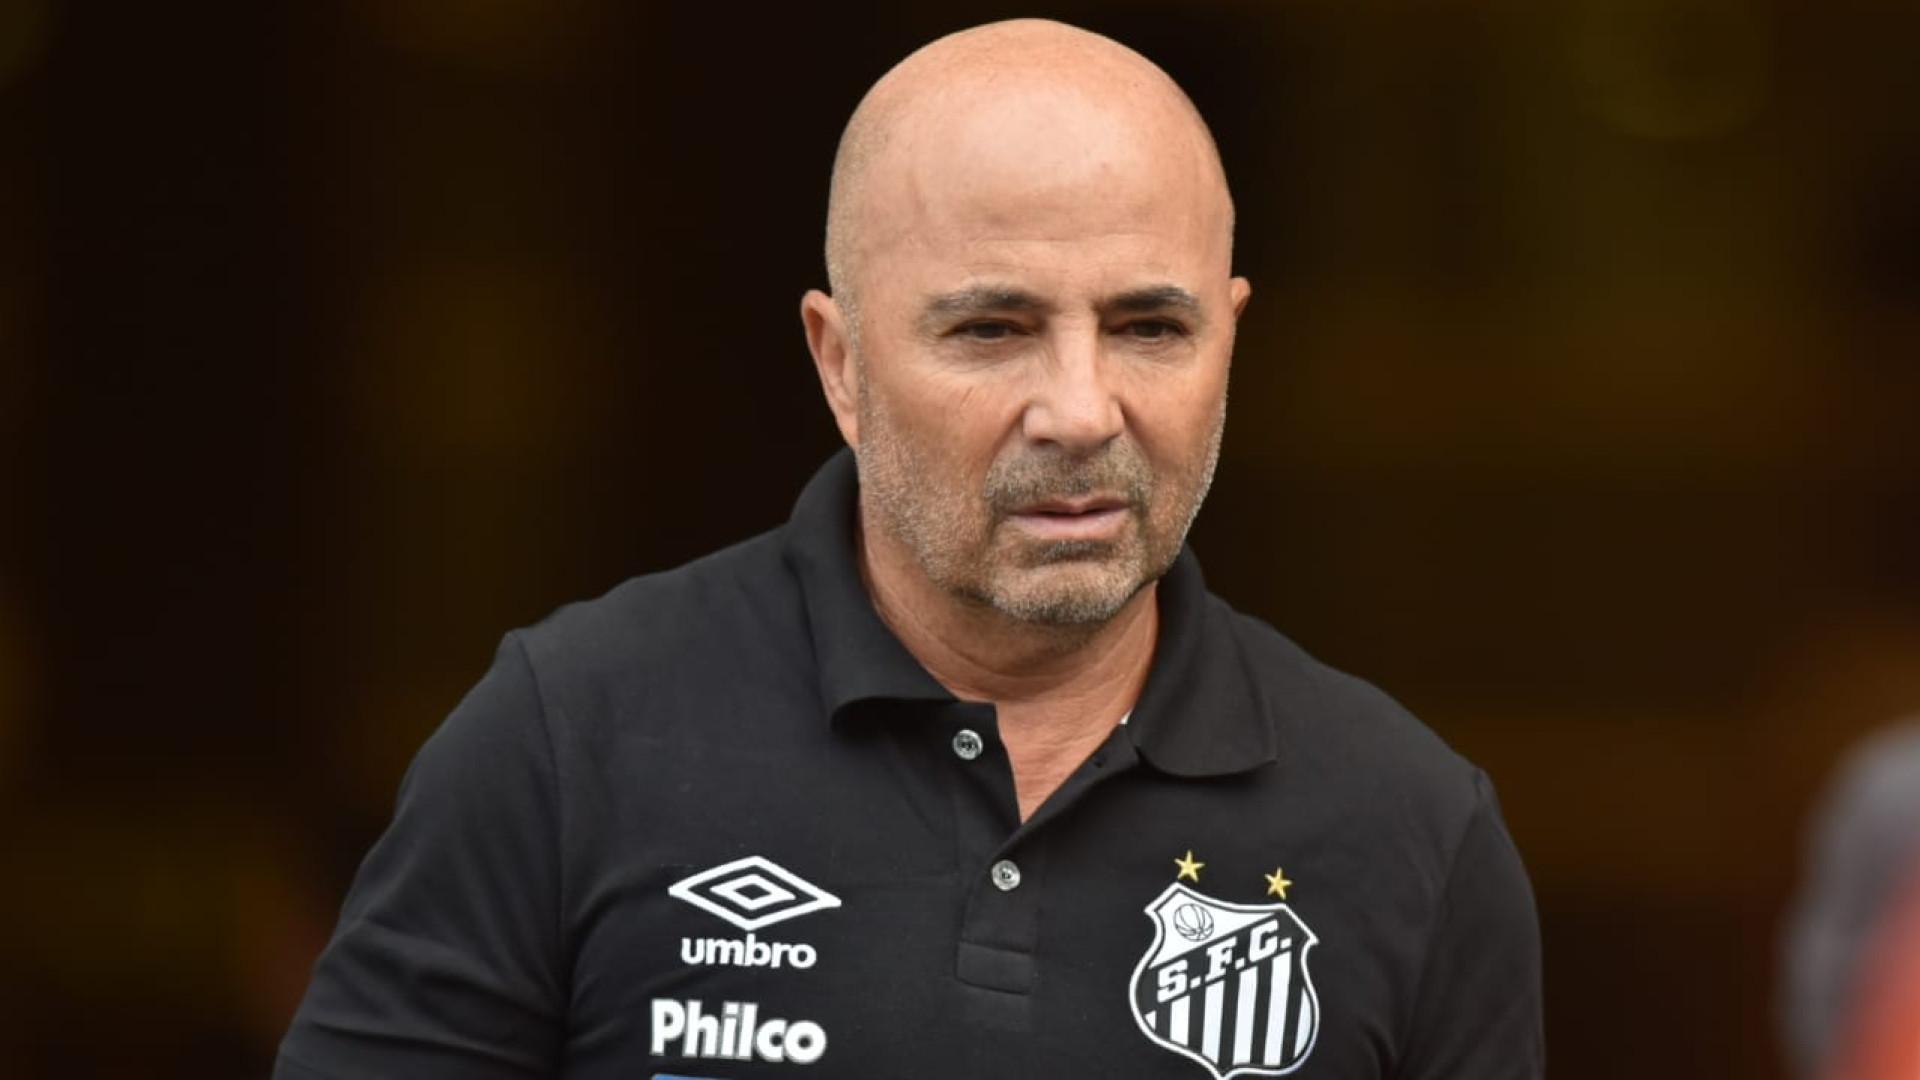 Sampaoli admite erro ao dar poucas chances ao atacante Sasha no Santos